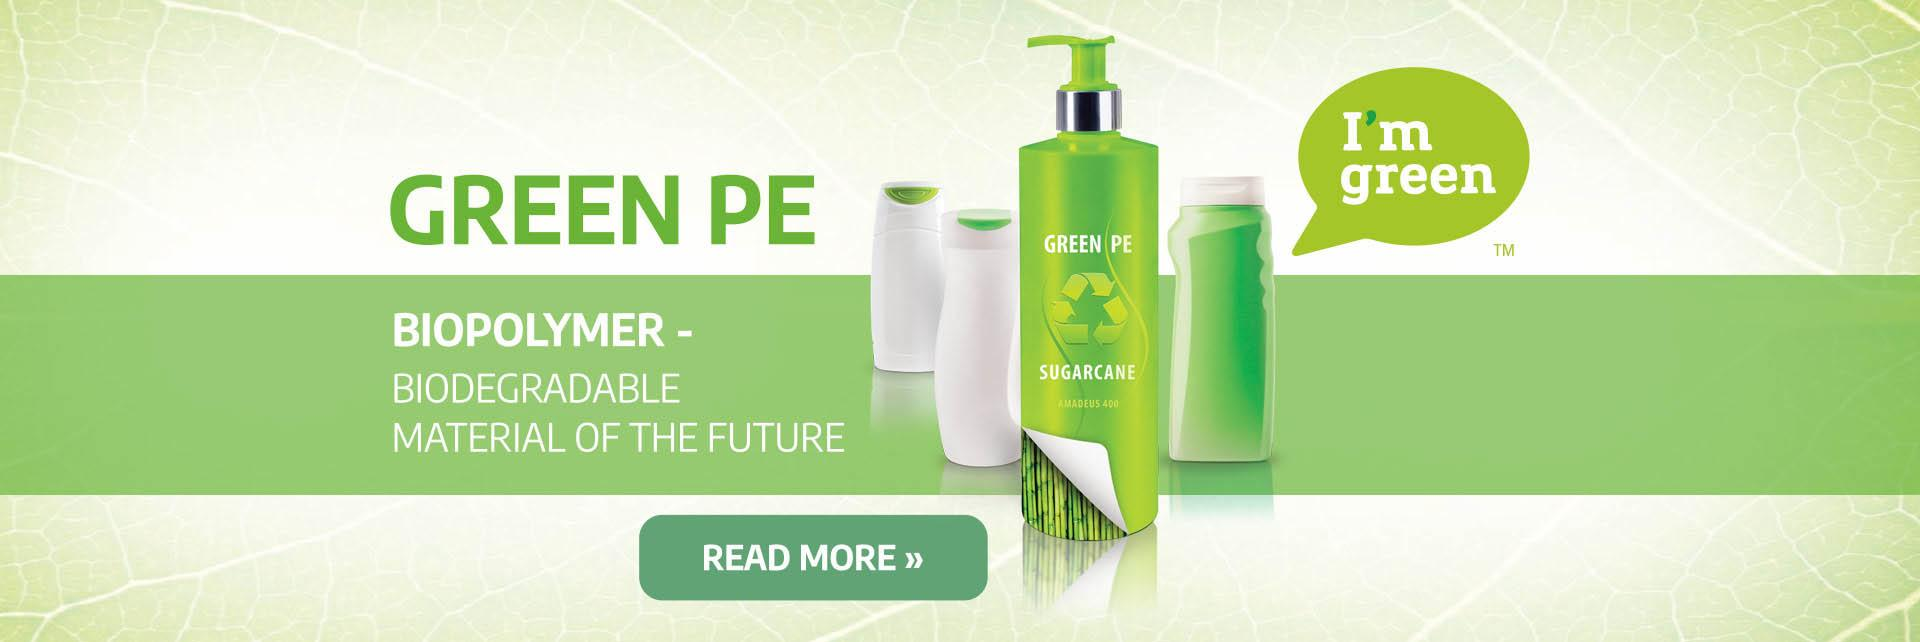 SLIDER GREEN PE BIOBOLIMERY.cdr